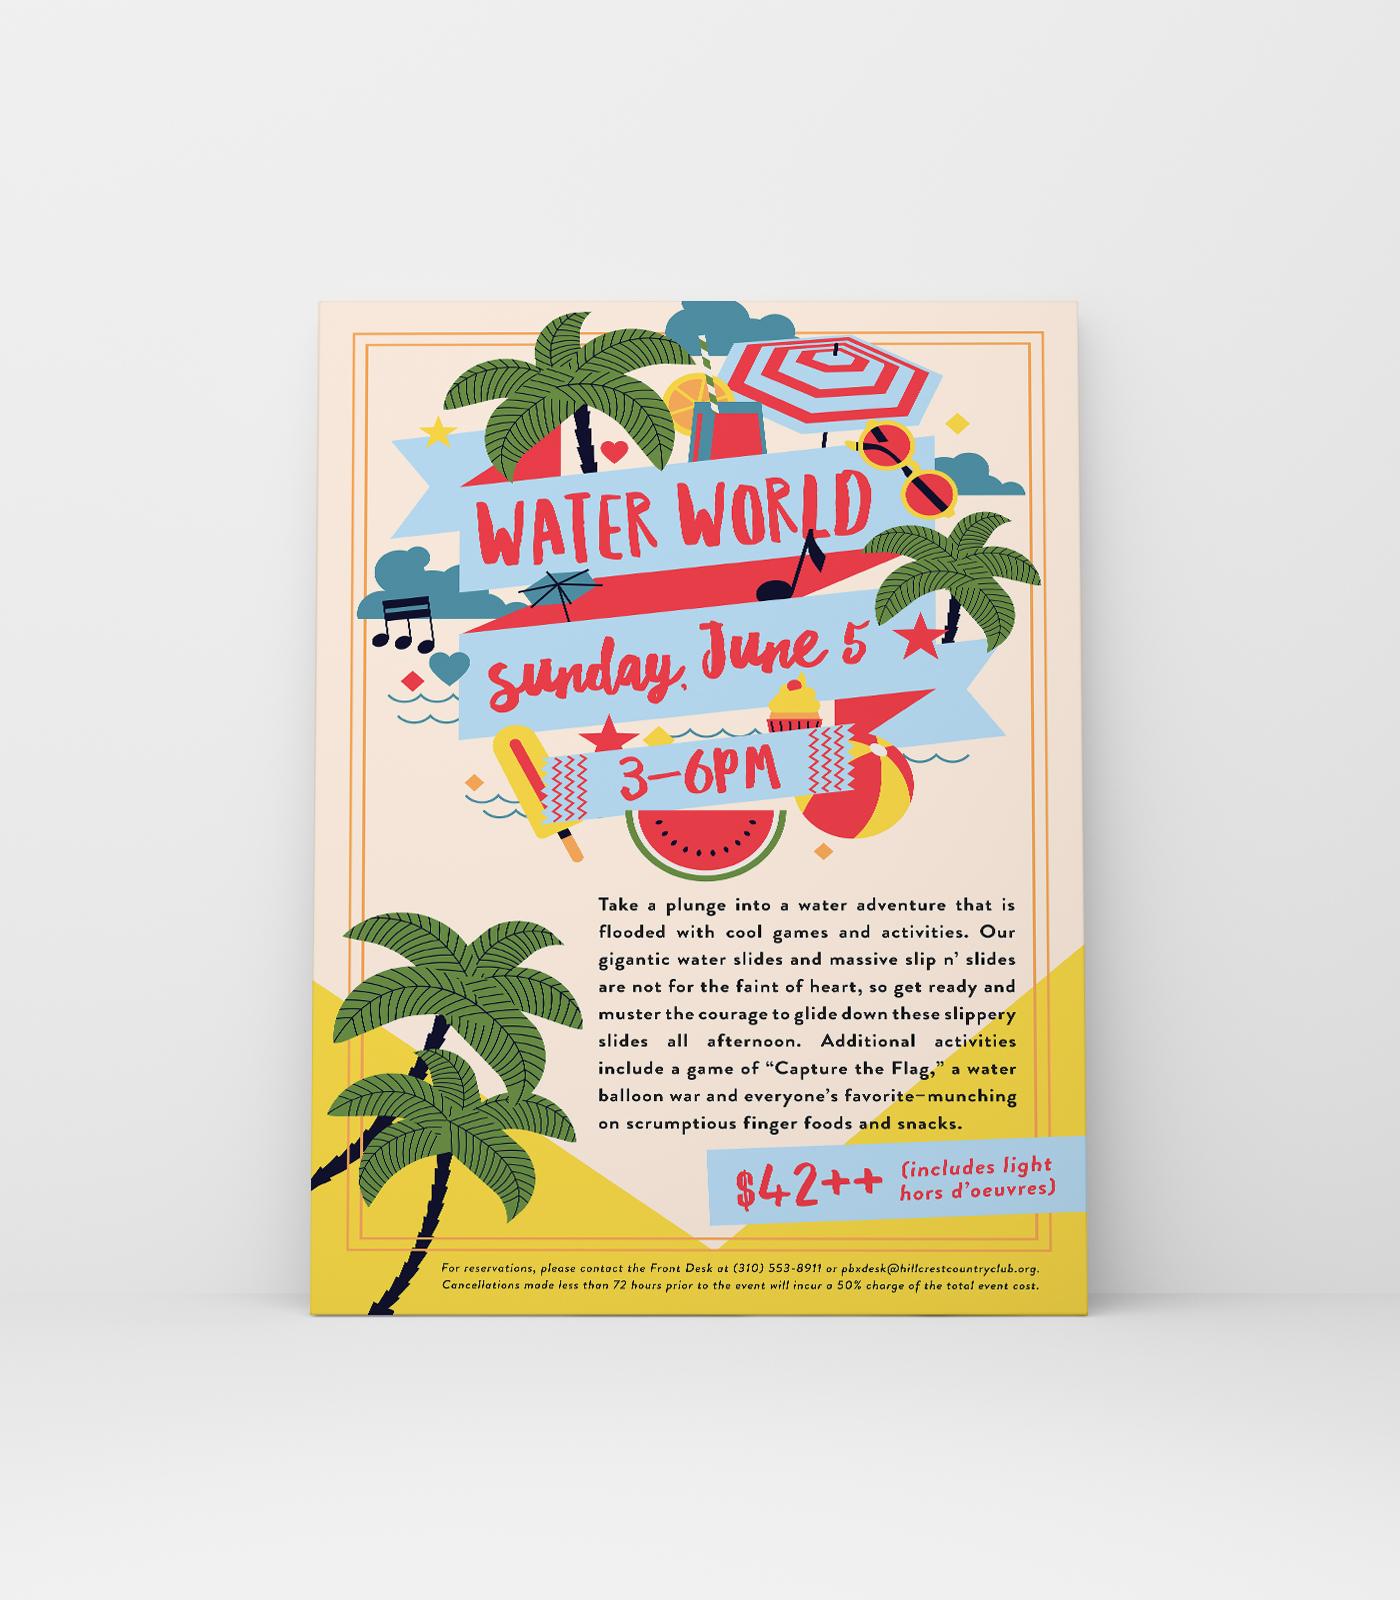 behance-template_forhccposters_waterworld22.jpg